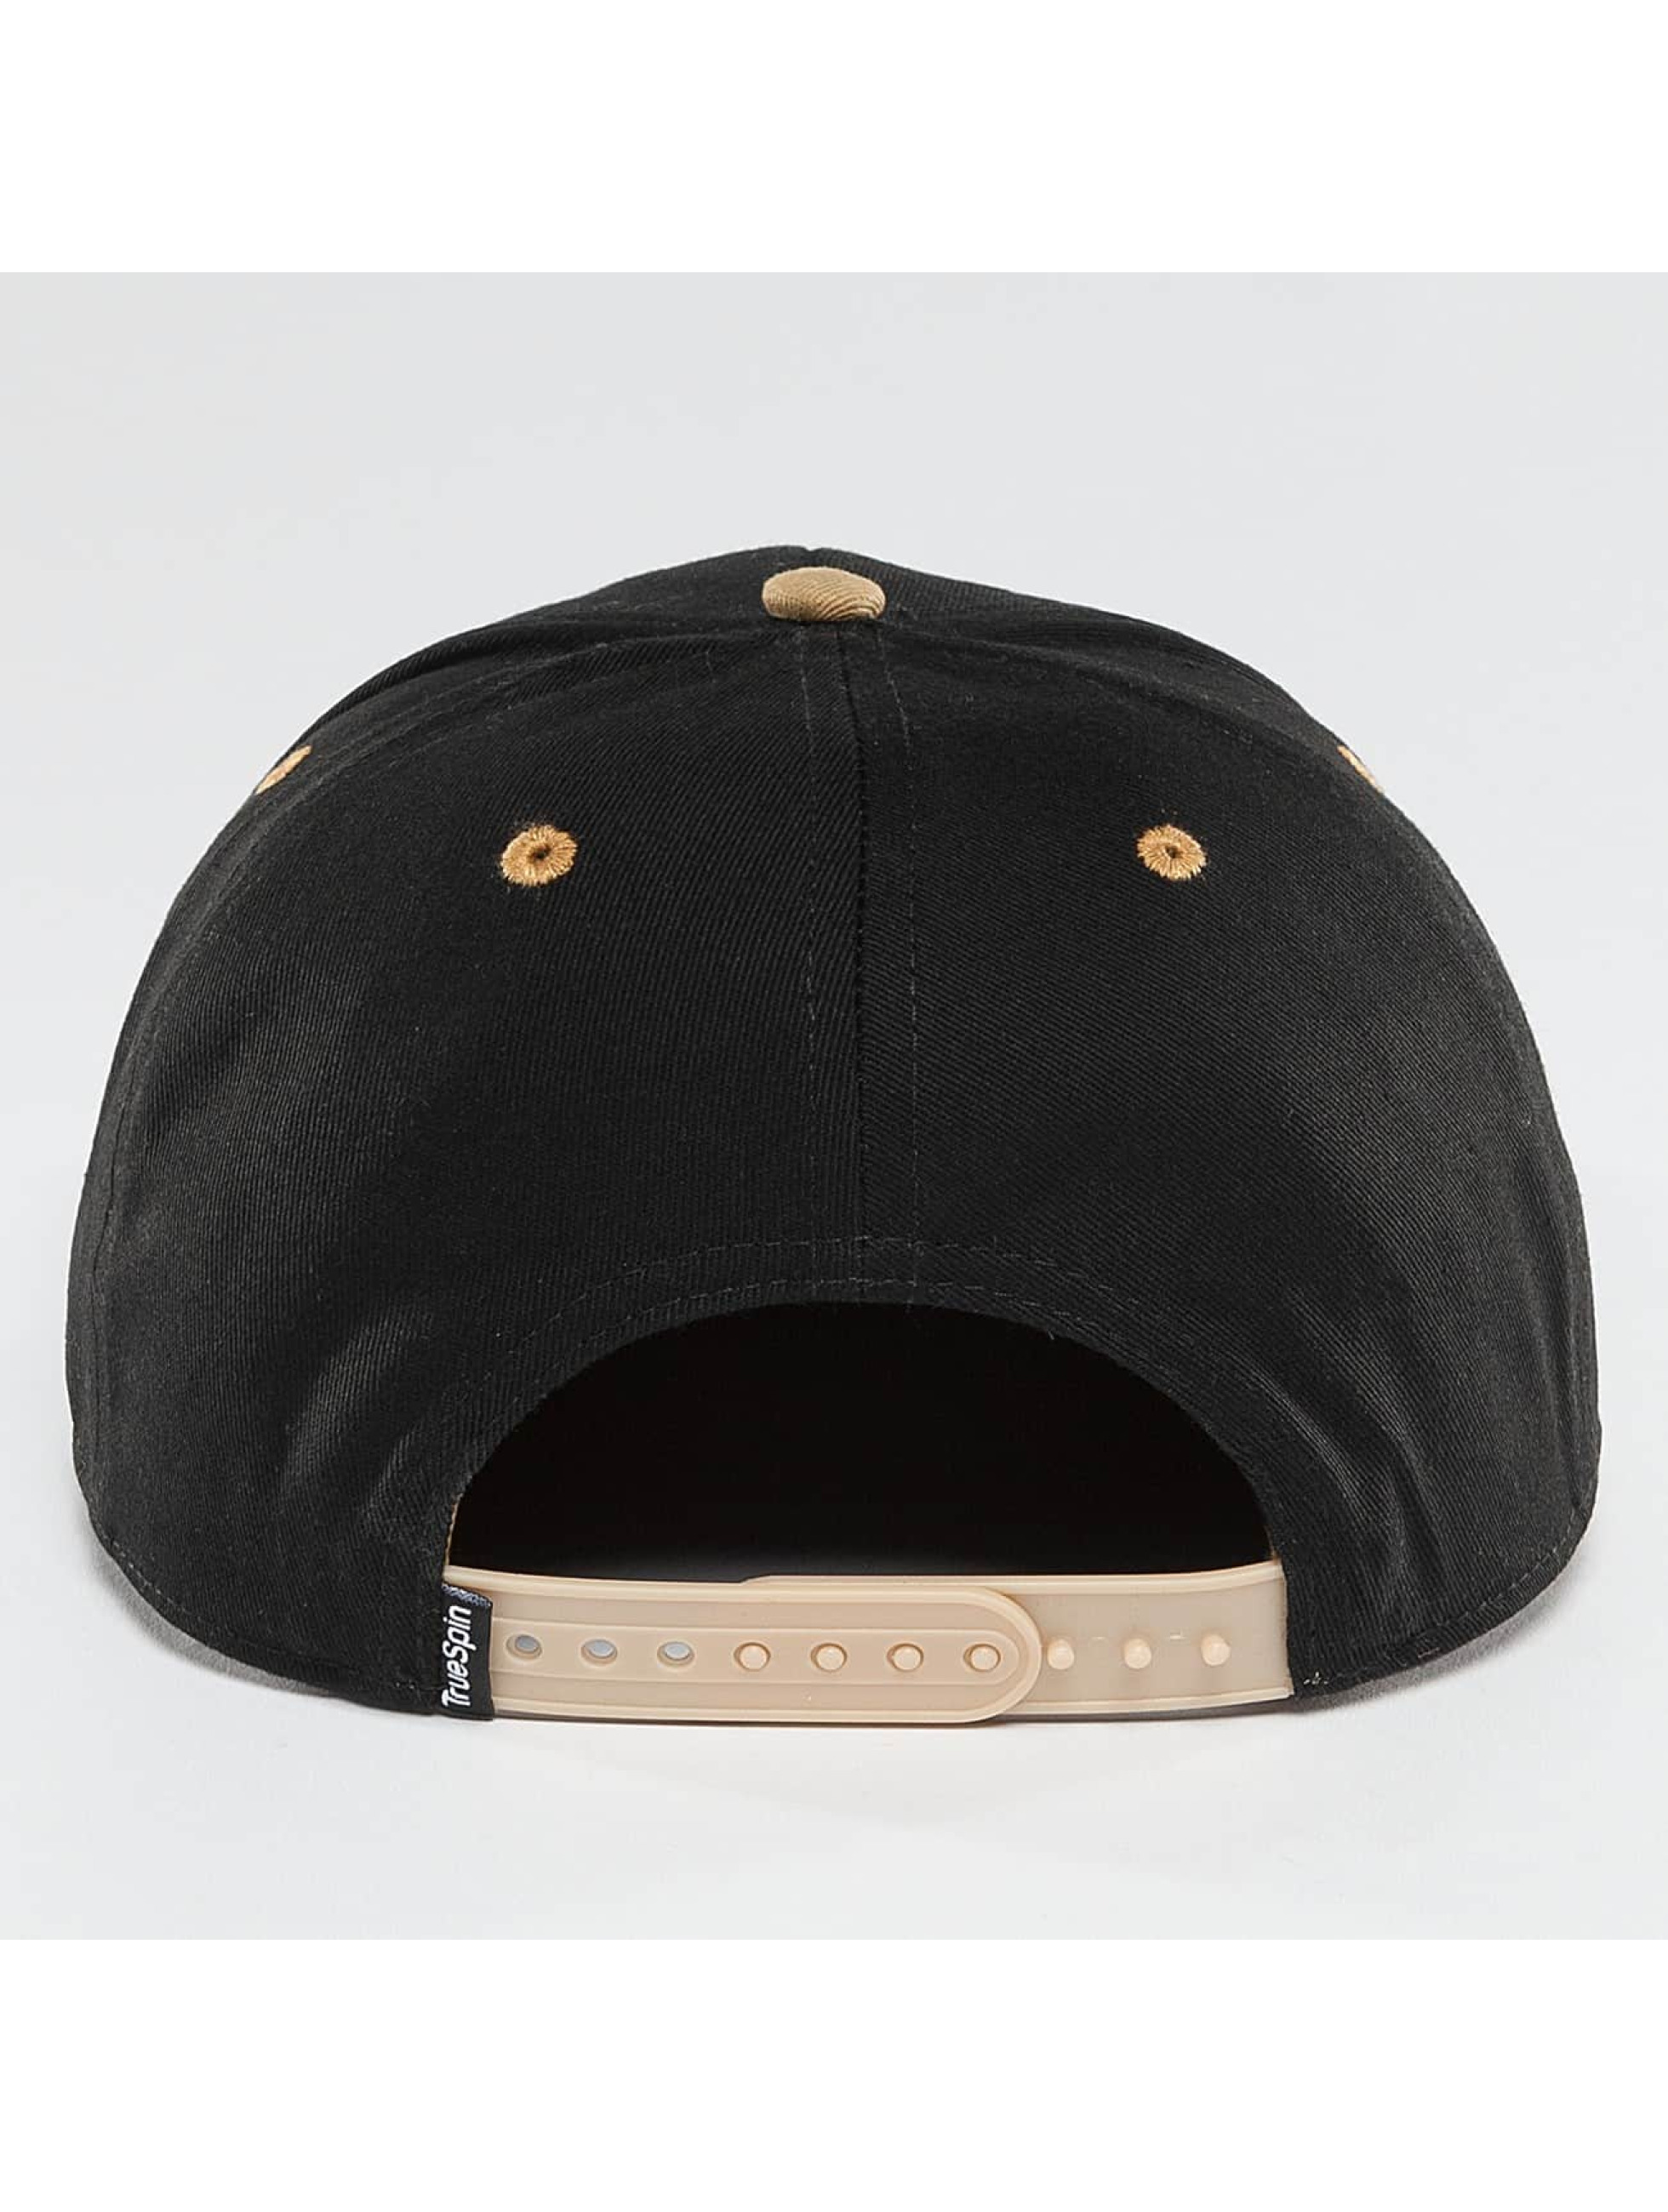 TrueSpin Casquette Snapback & Strapback 4 Letters noir